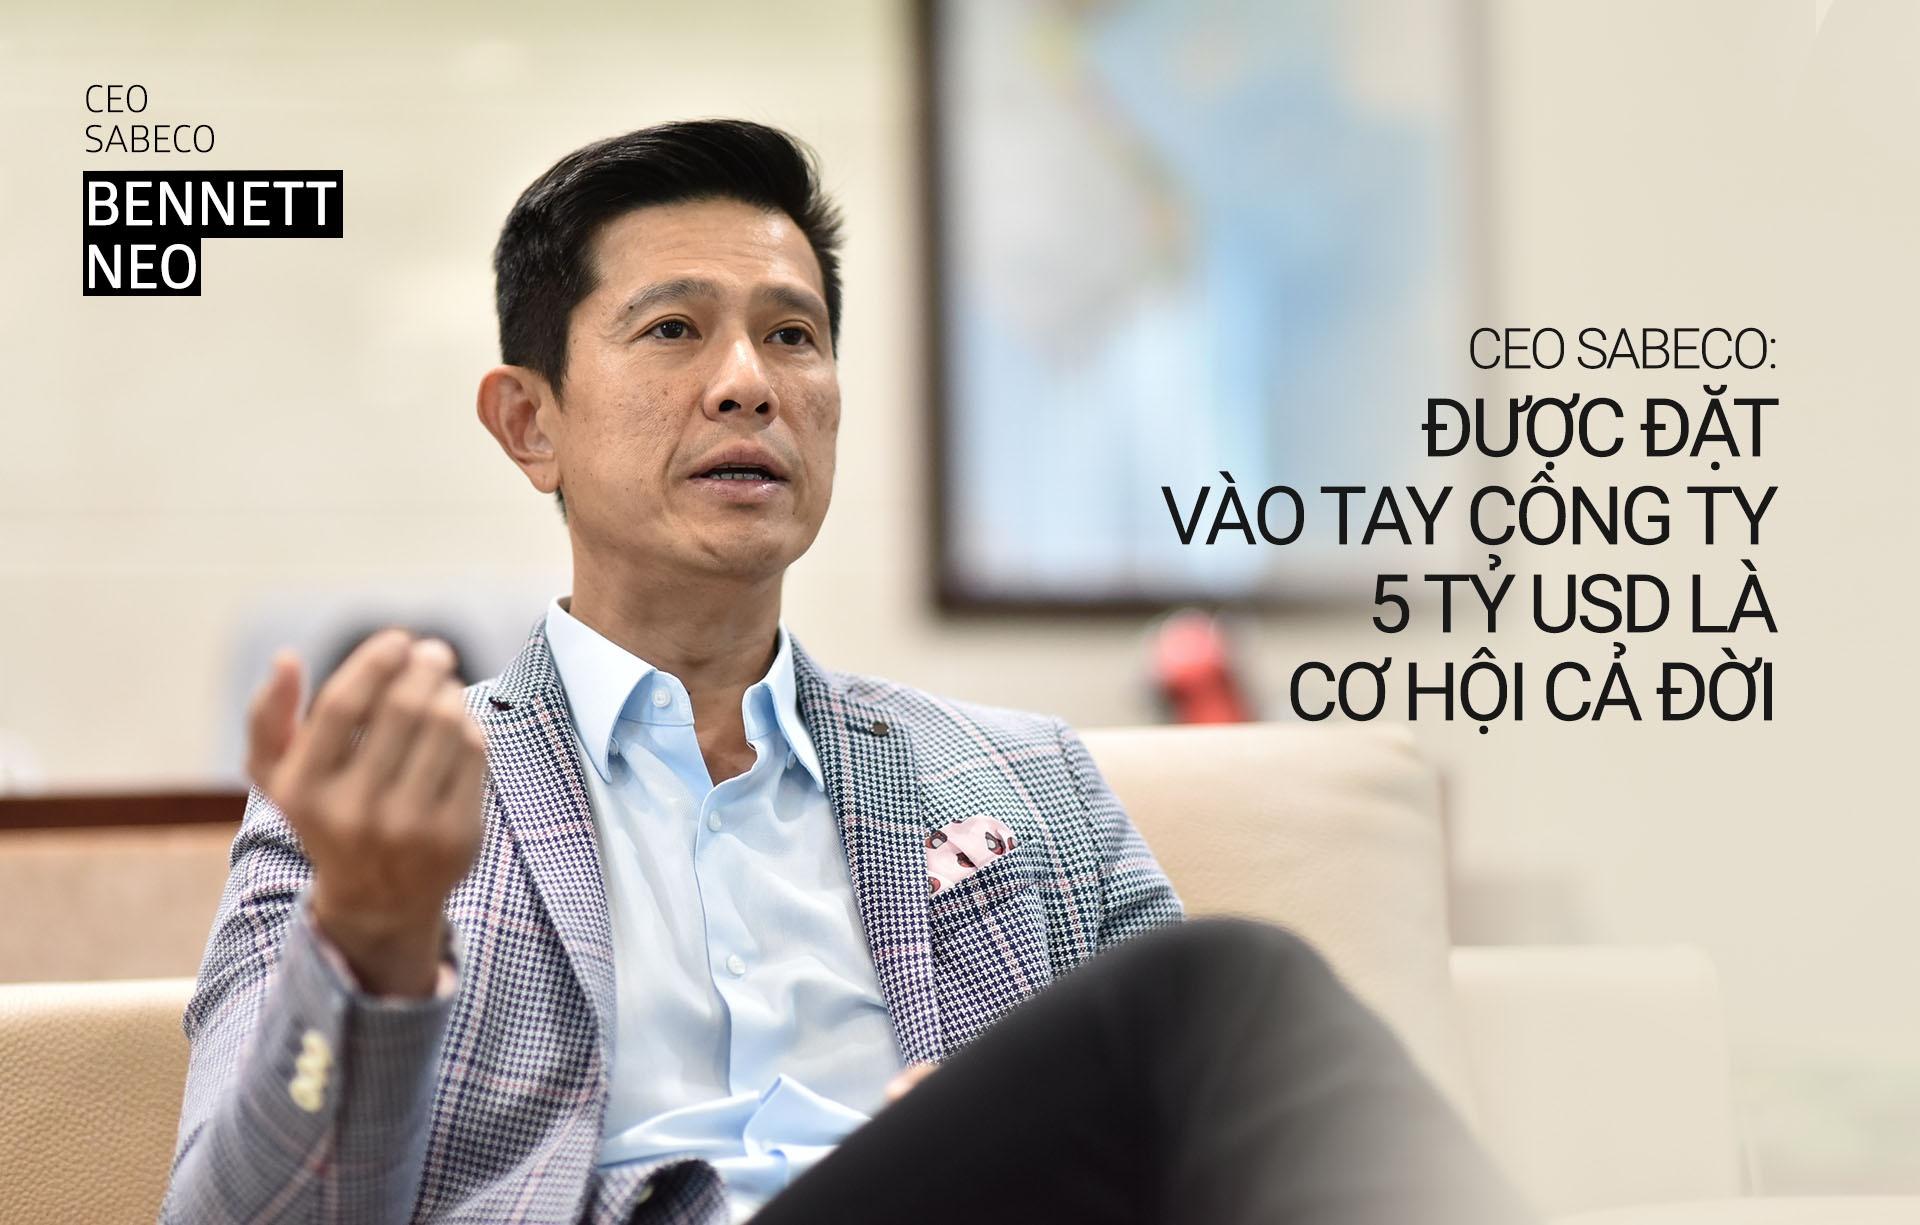 CEO Sabeco: 'Duoc dieu hanh cong ty 5 ty USD la co hoi ca doi' hinh anh 2